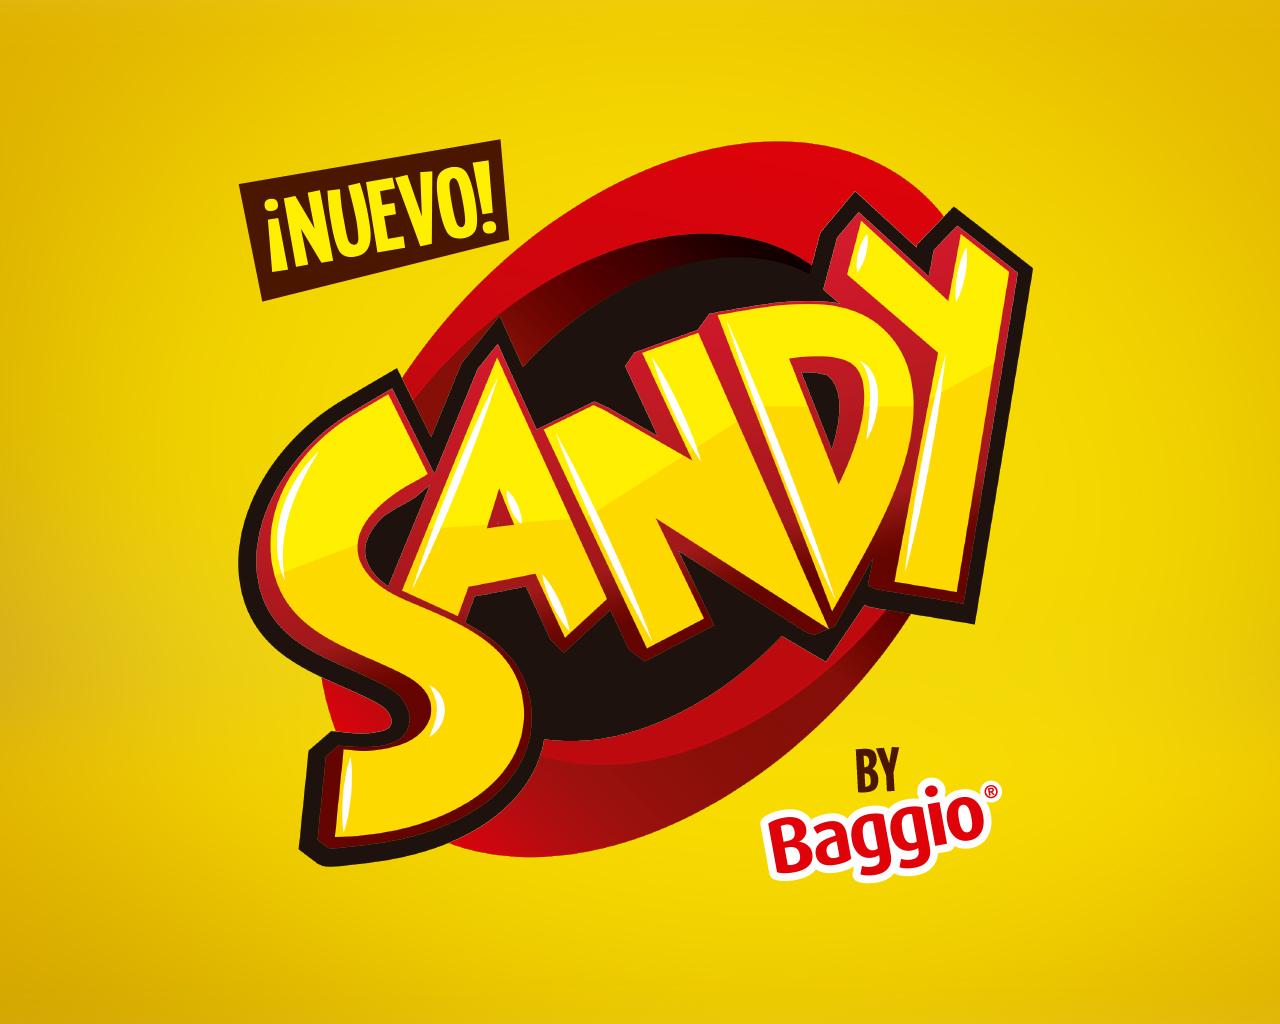 Sandy by Baggio